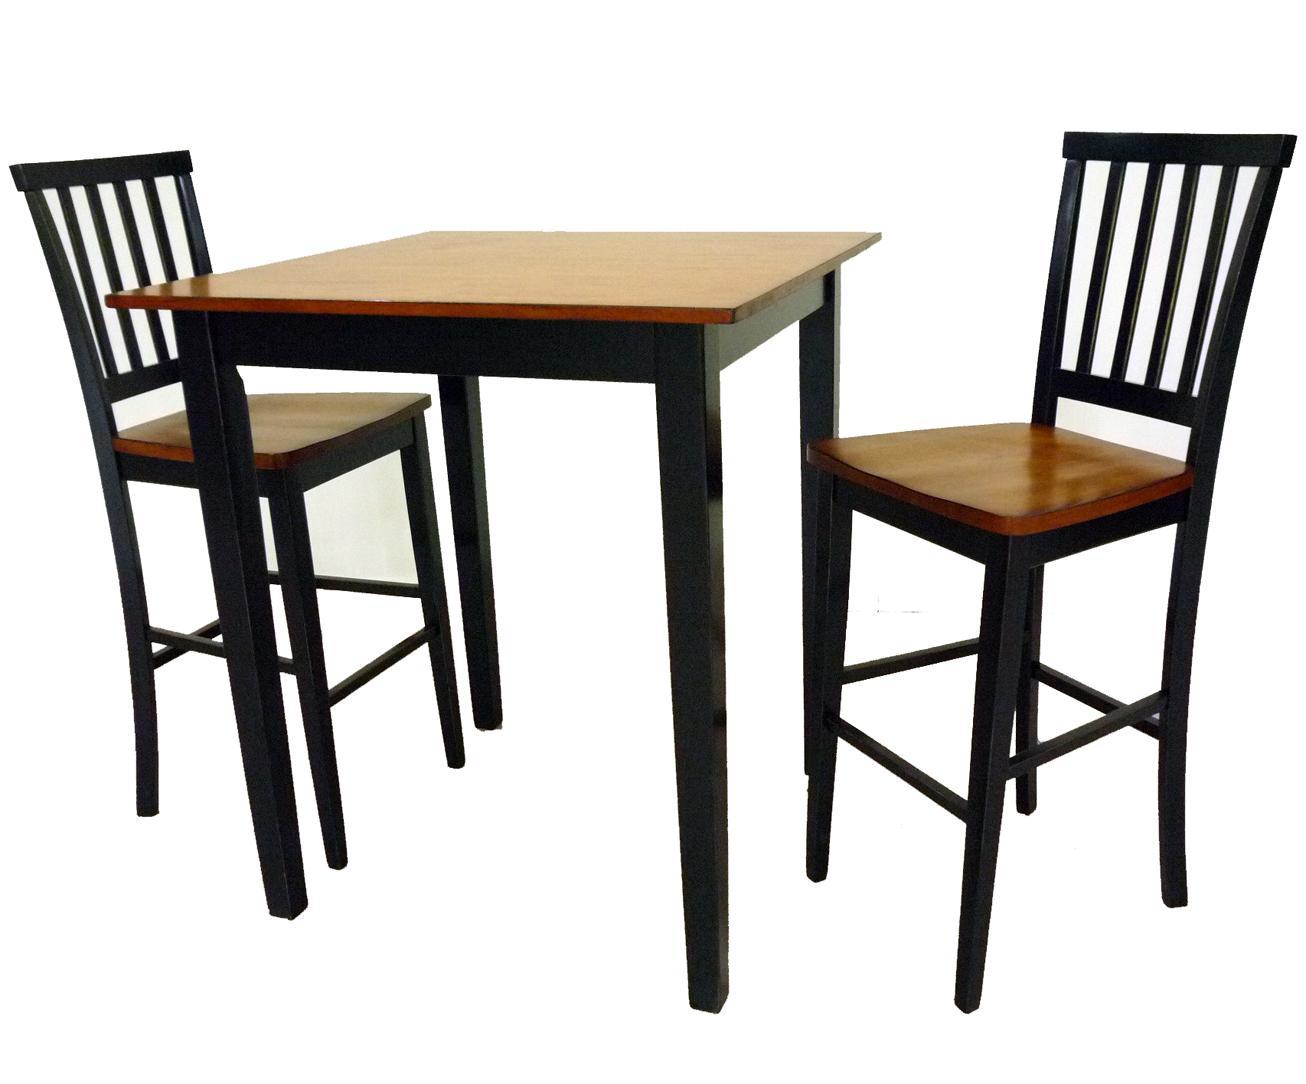 Intercon Arlington 3 Piece Pub Table & Stool Set - Item Number: AR-3642P-BSE+3636P-TOP+2xBS-180-K30